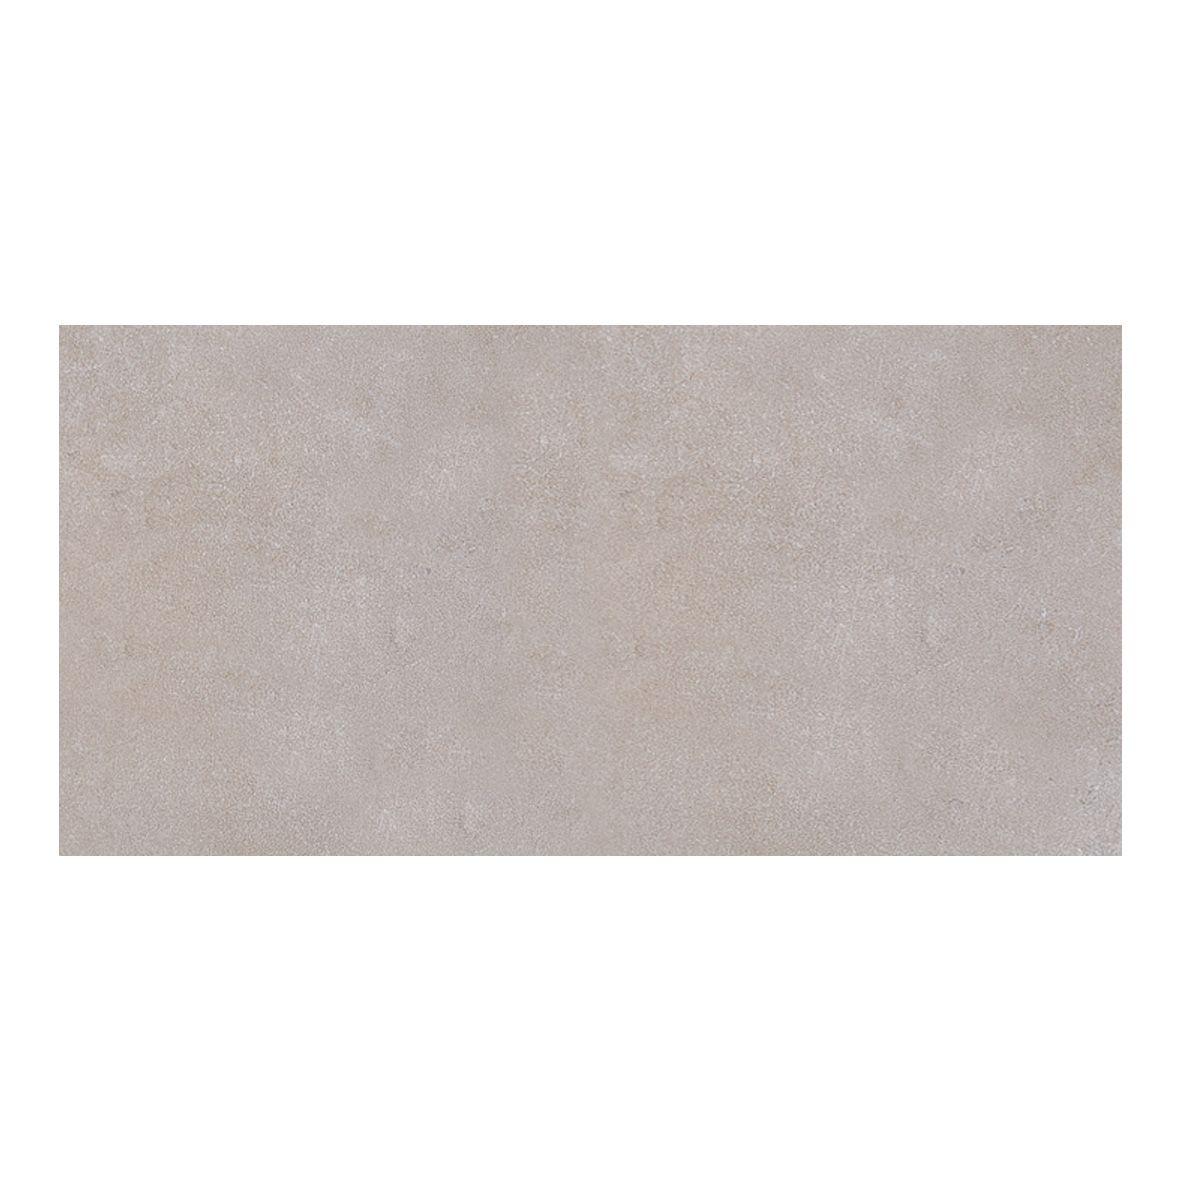 Young stone wall tiles grey tiles ceramic tile distributors young stone wall tiles grey tiles ceramic tile distributors dailygadgetfo Images